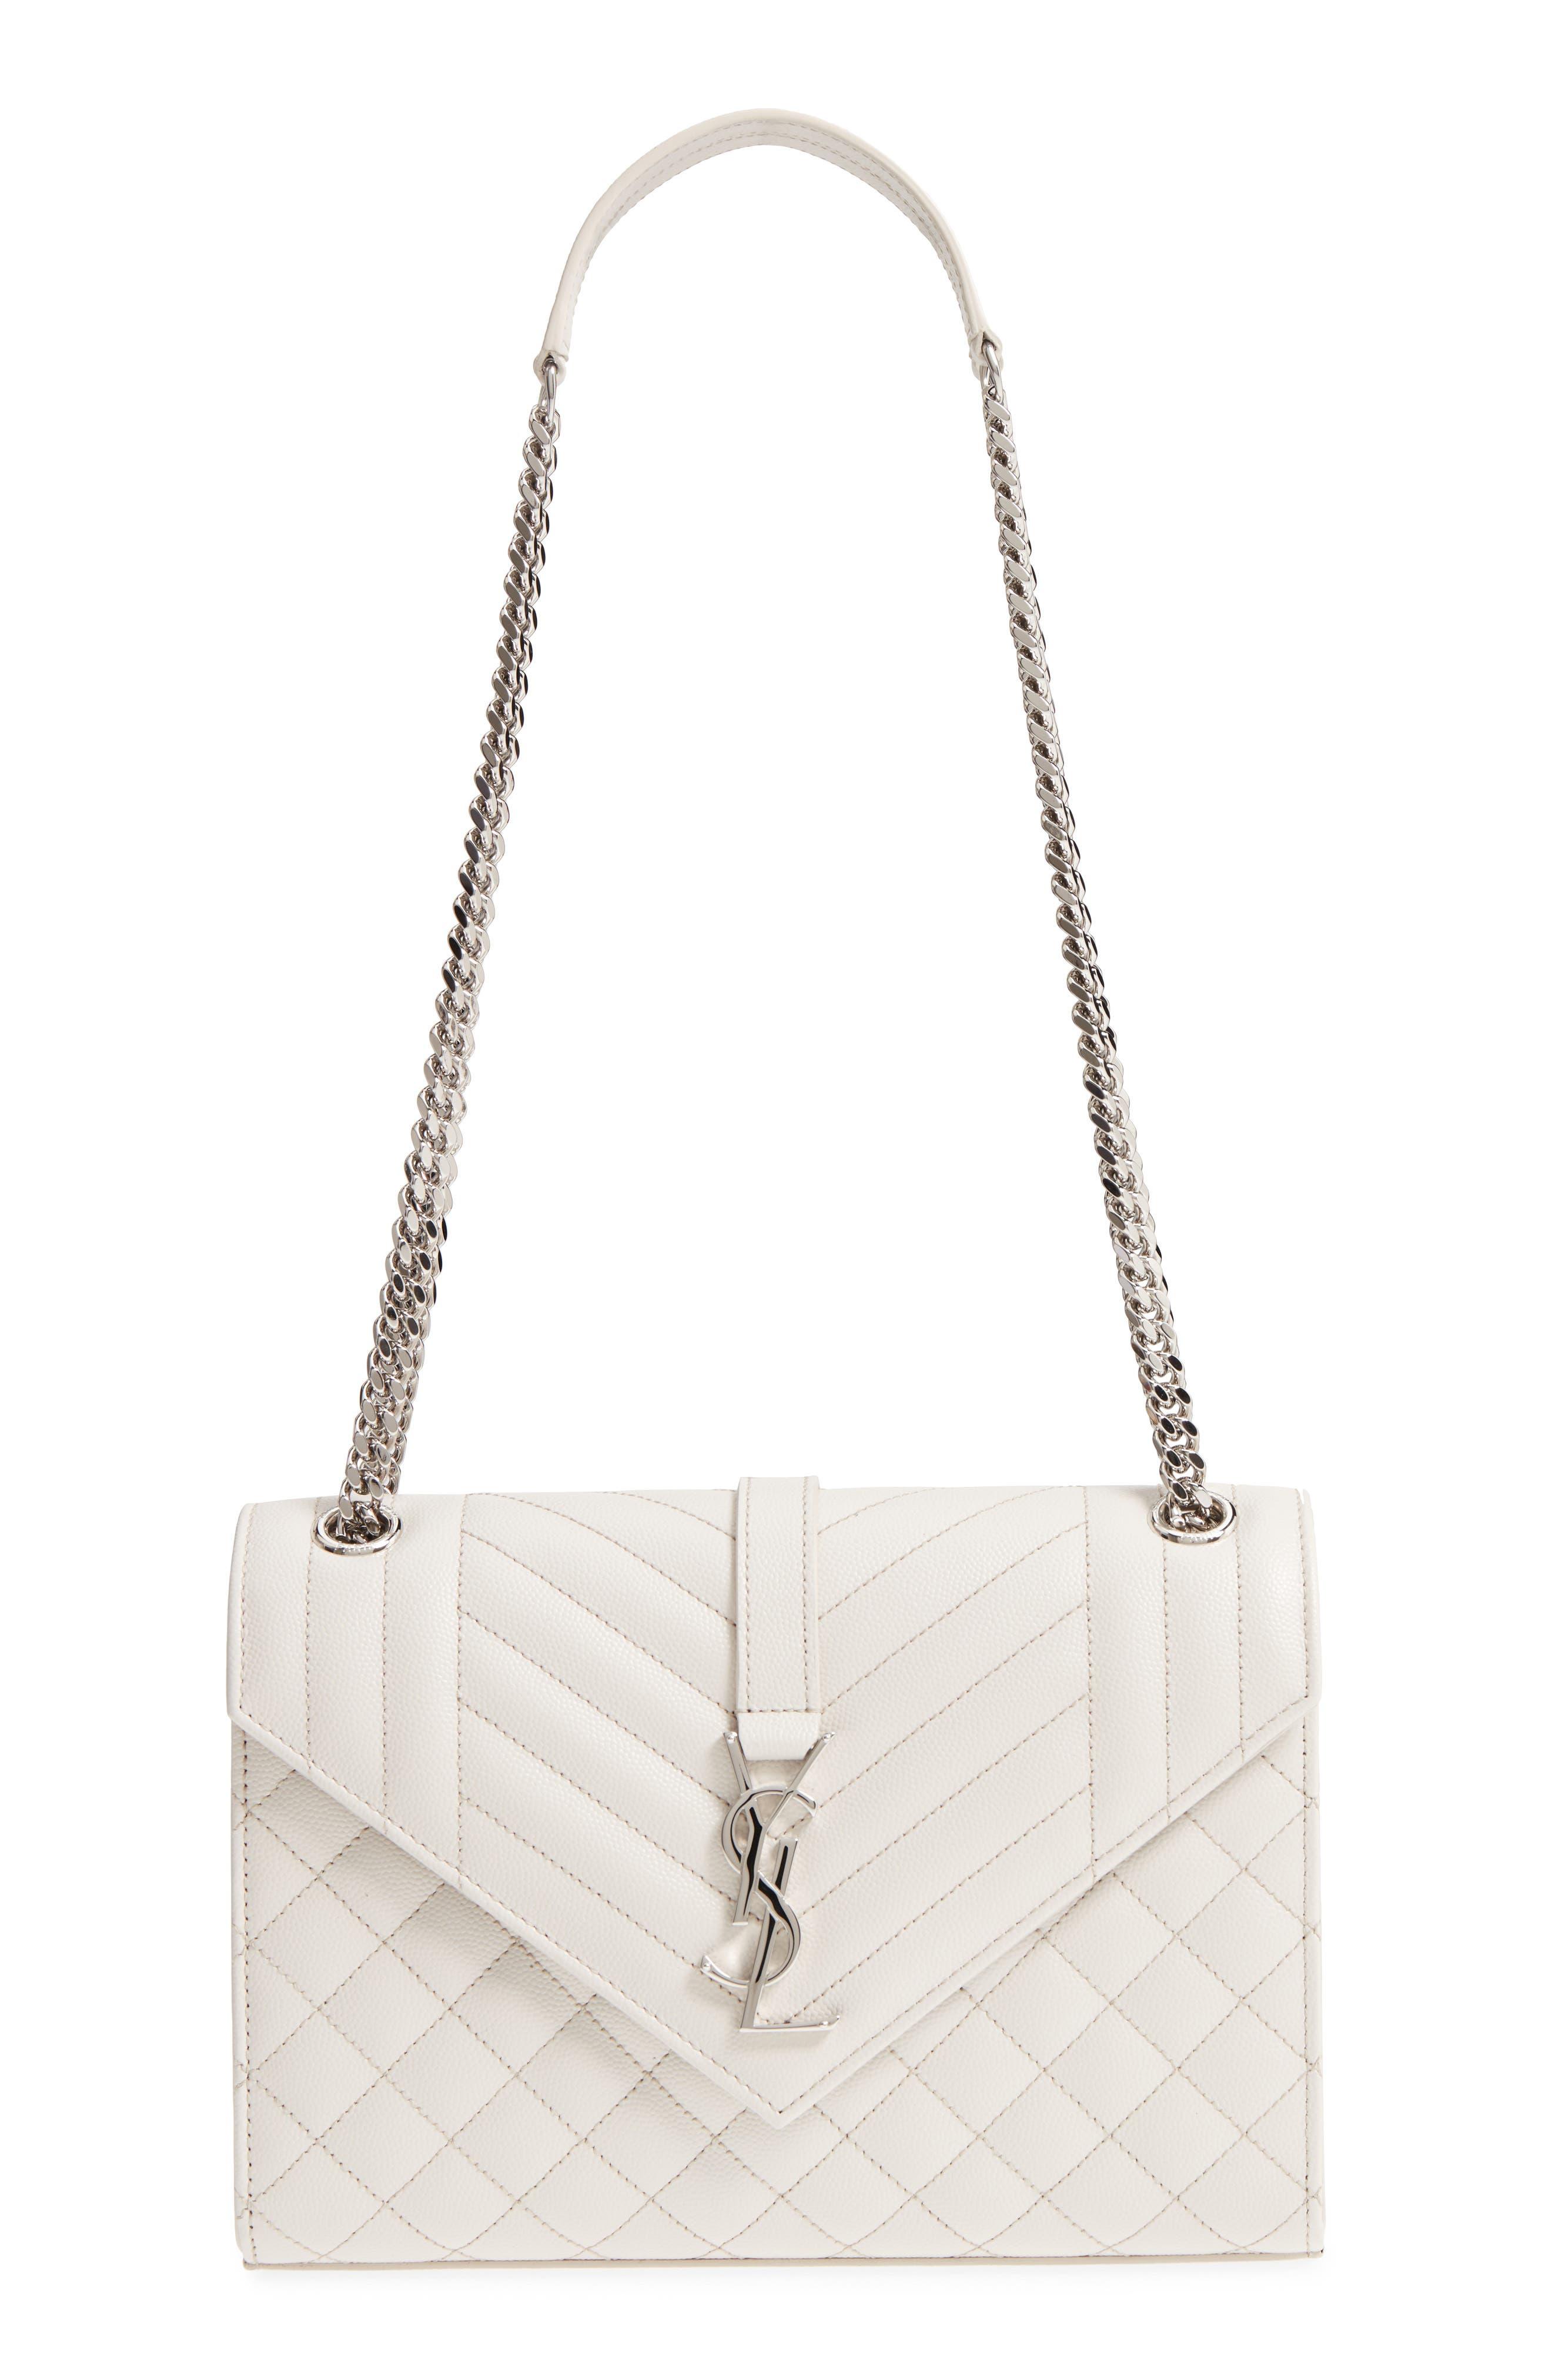 Medium Cassandra Calfskin Shoulder Bag,                         Main,                         color, ICY WHITE/ ICY WHITE